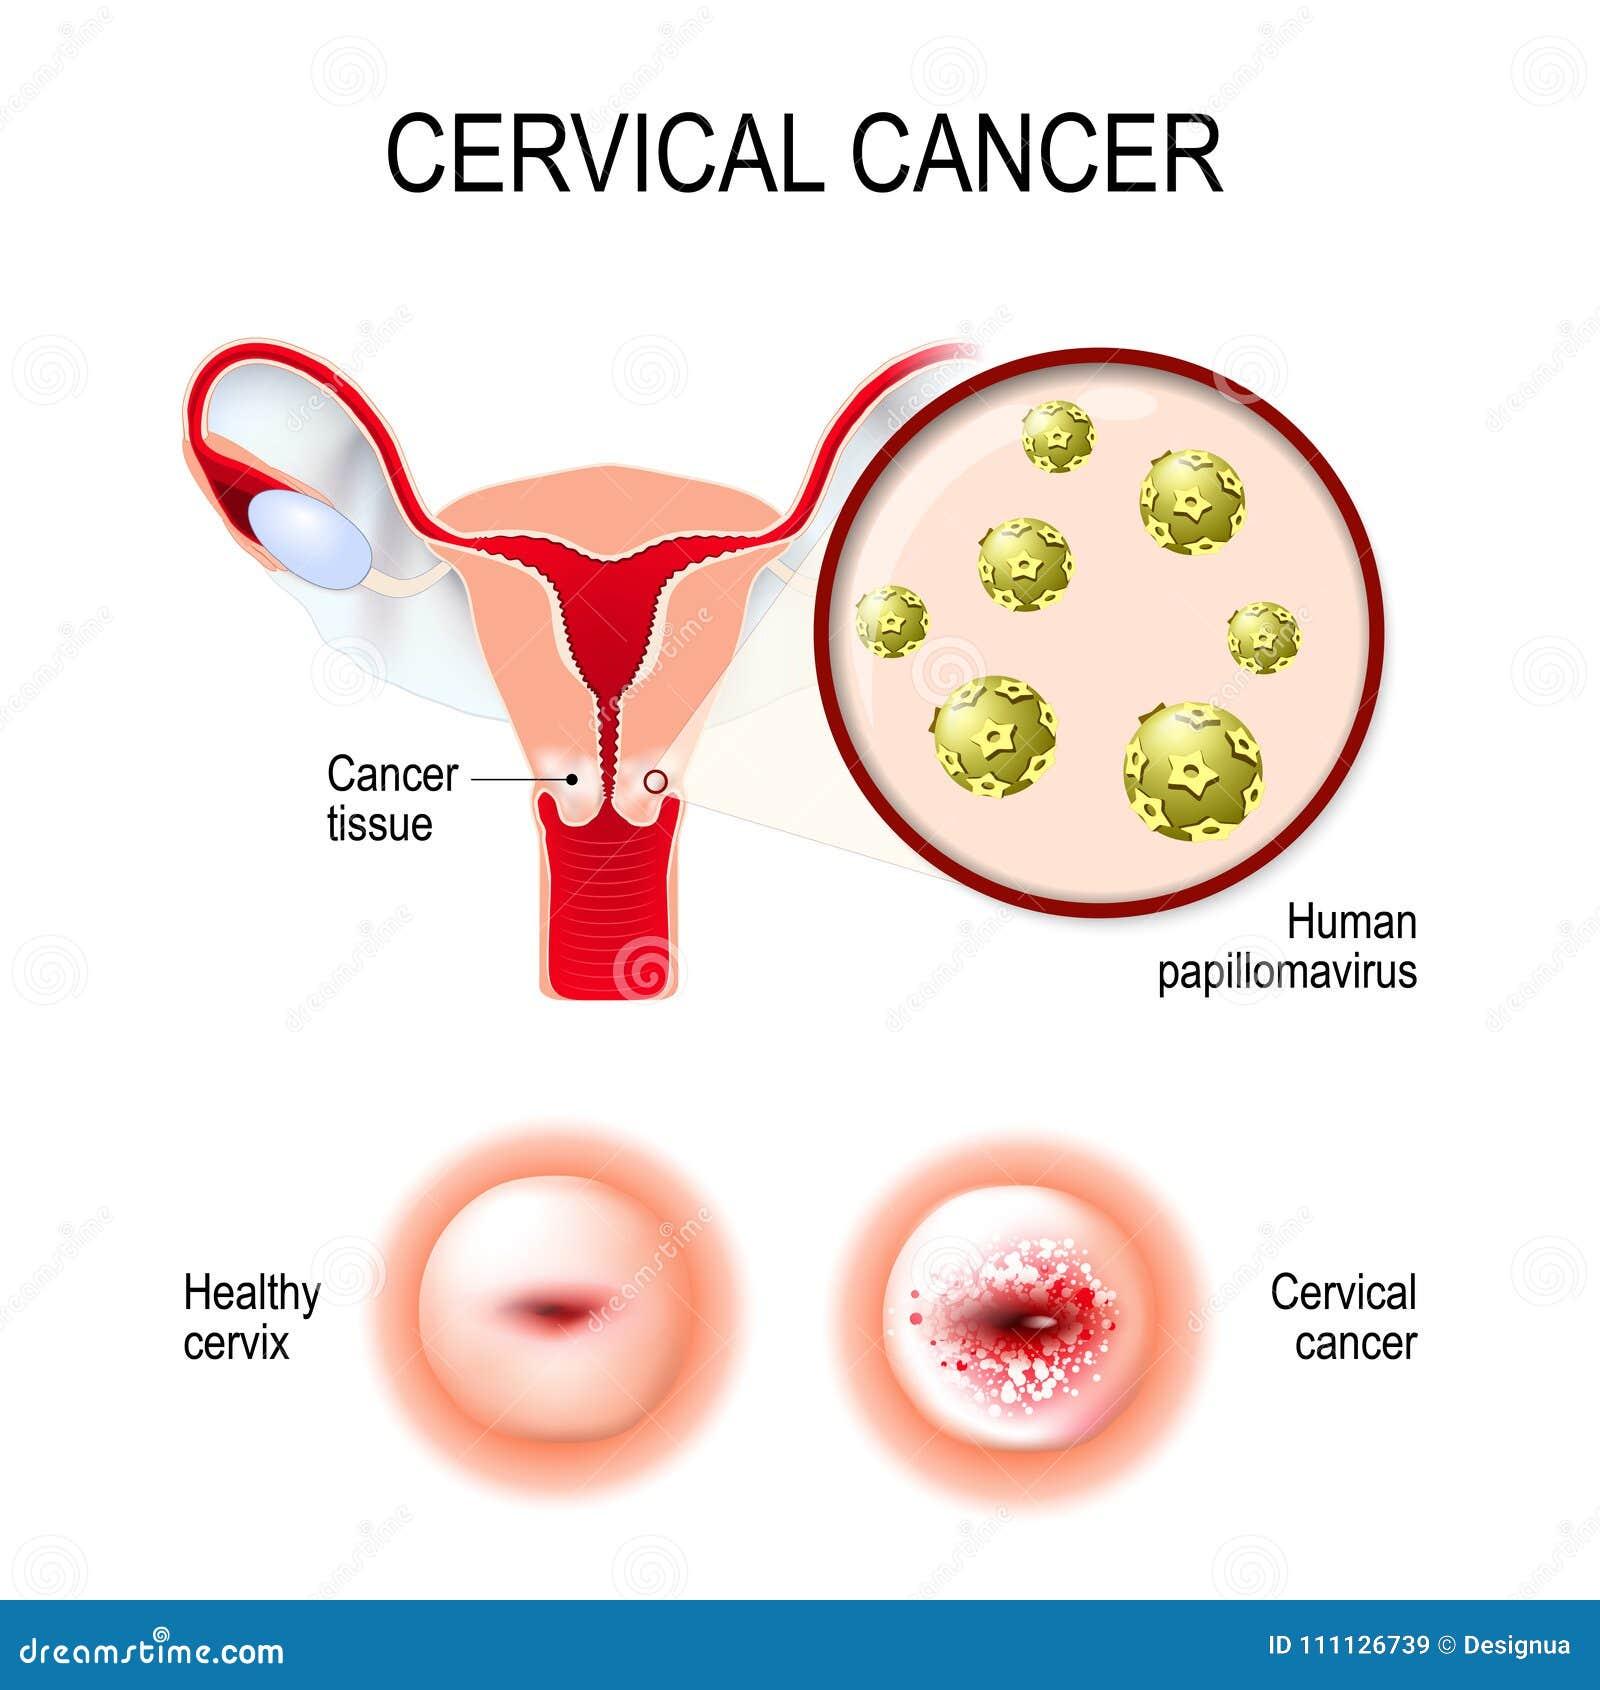 human papillomavirus infection cervical cancer)